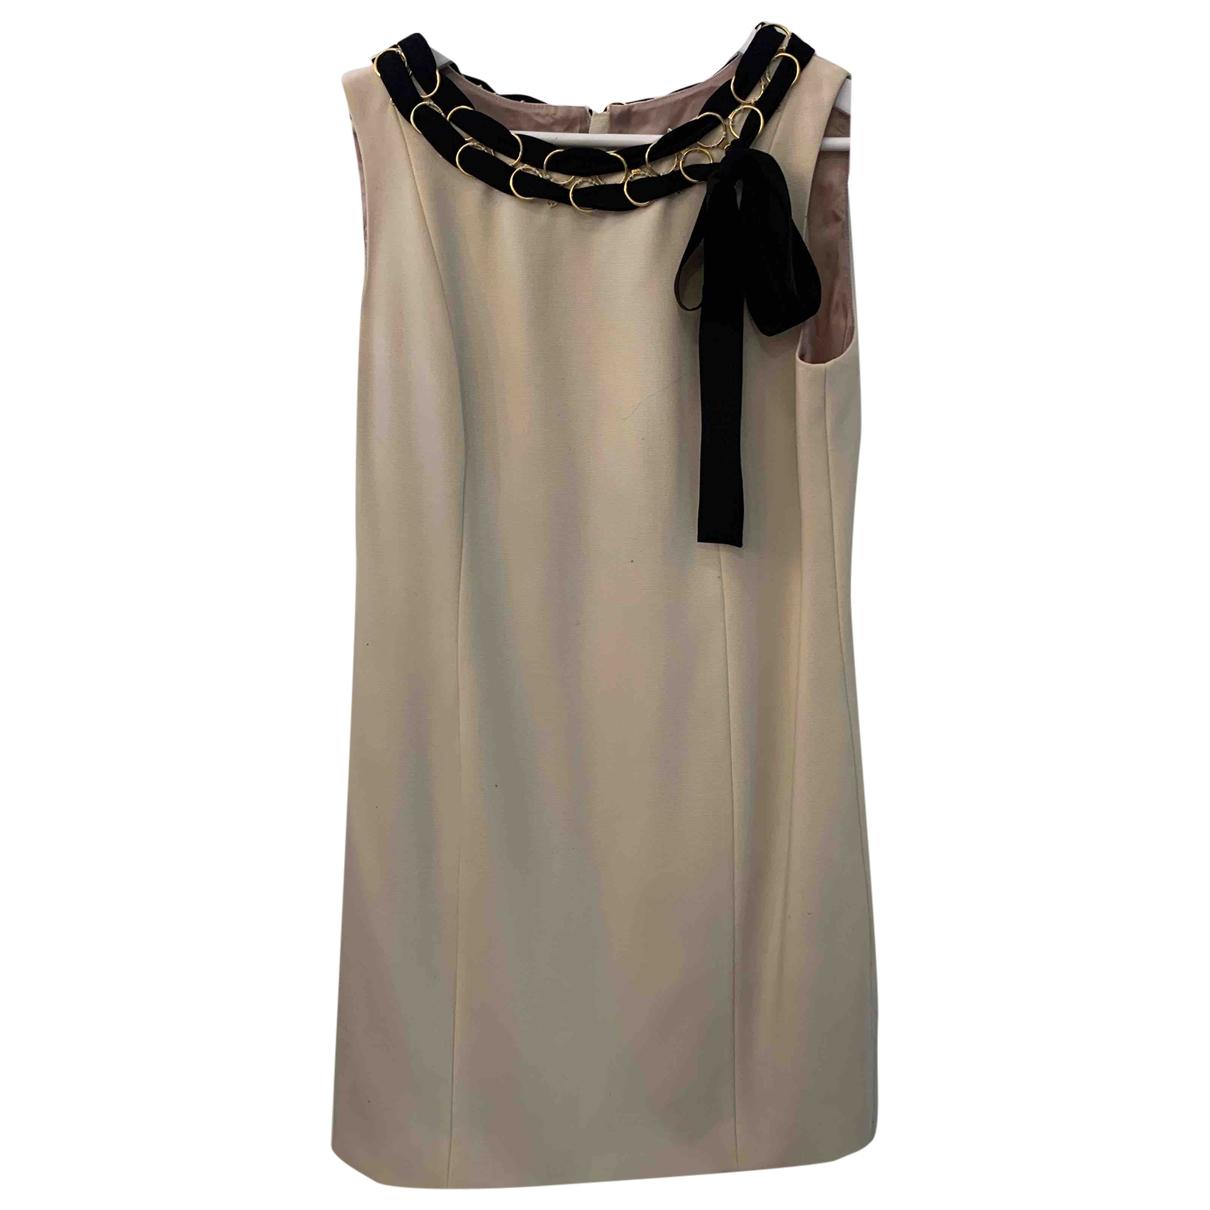 Moschino \N Kleid in  Ecru Wolle